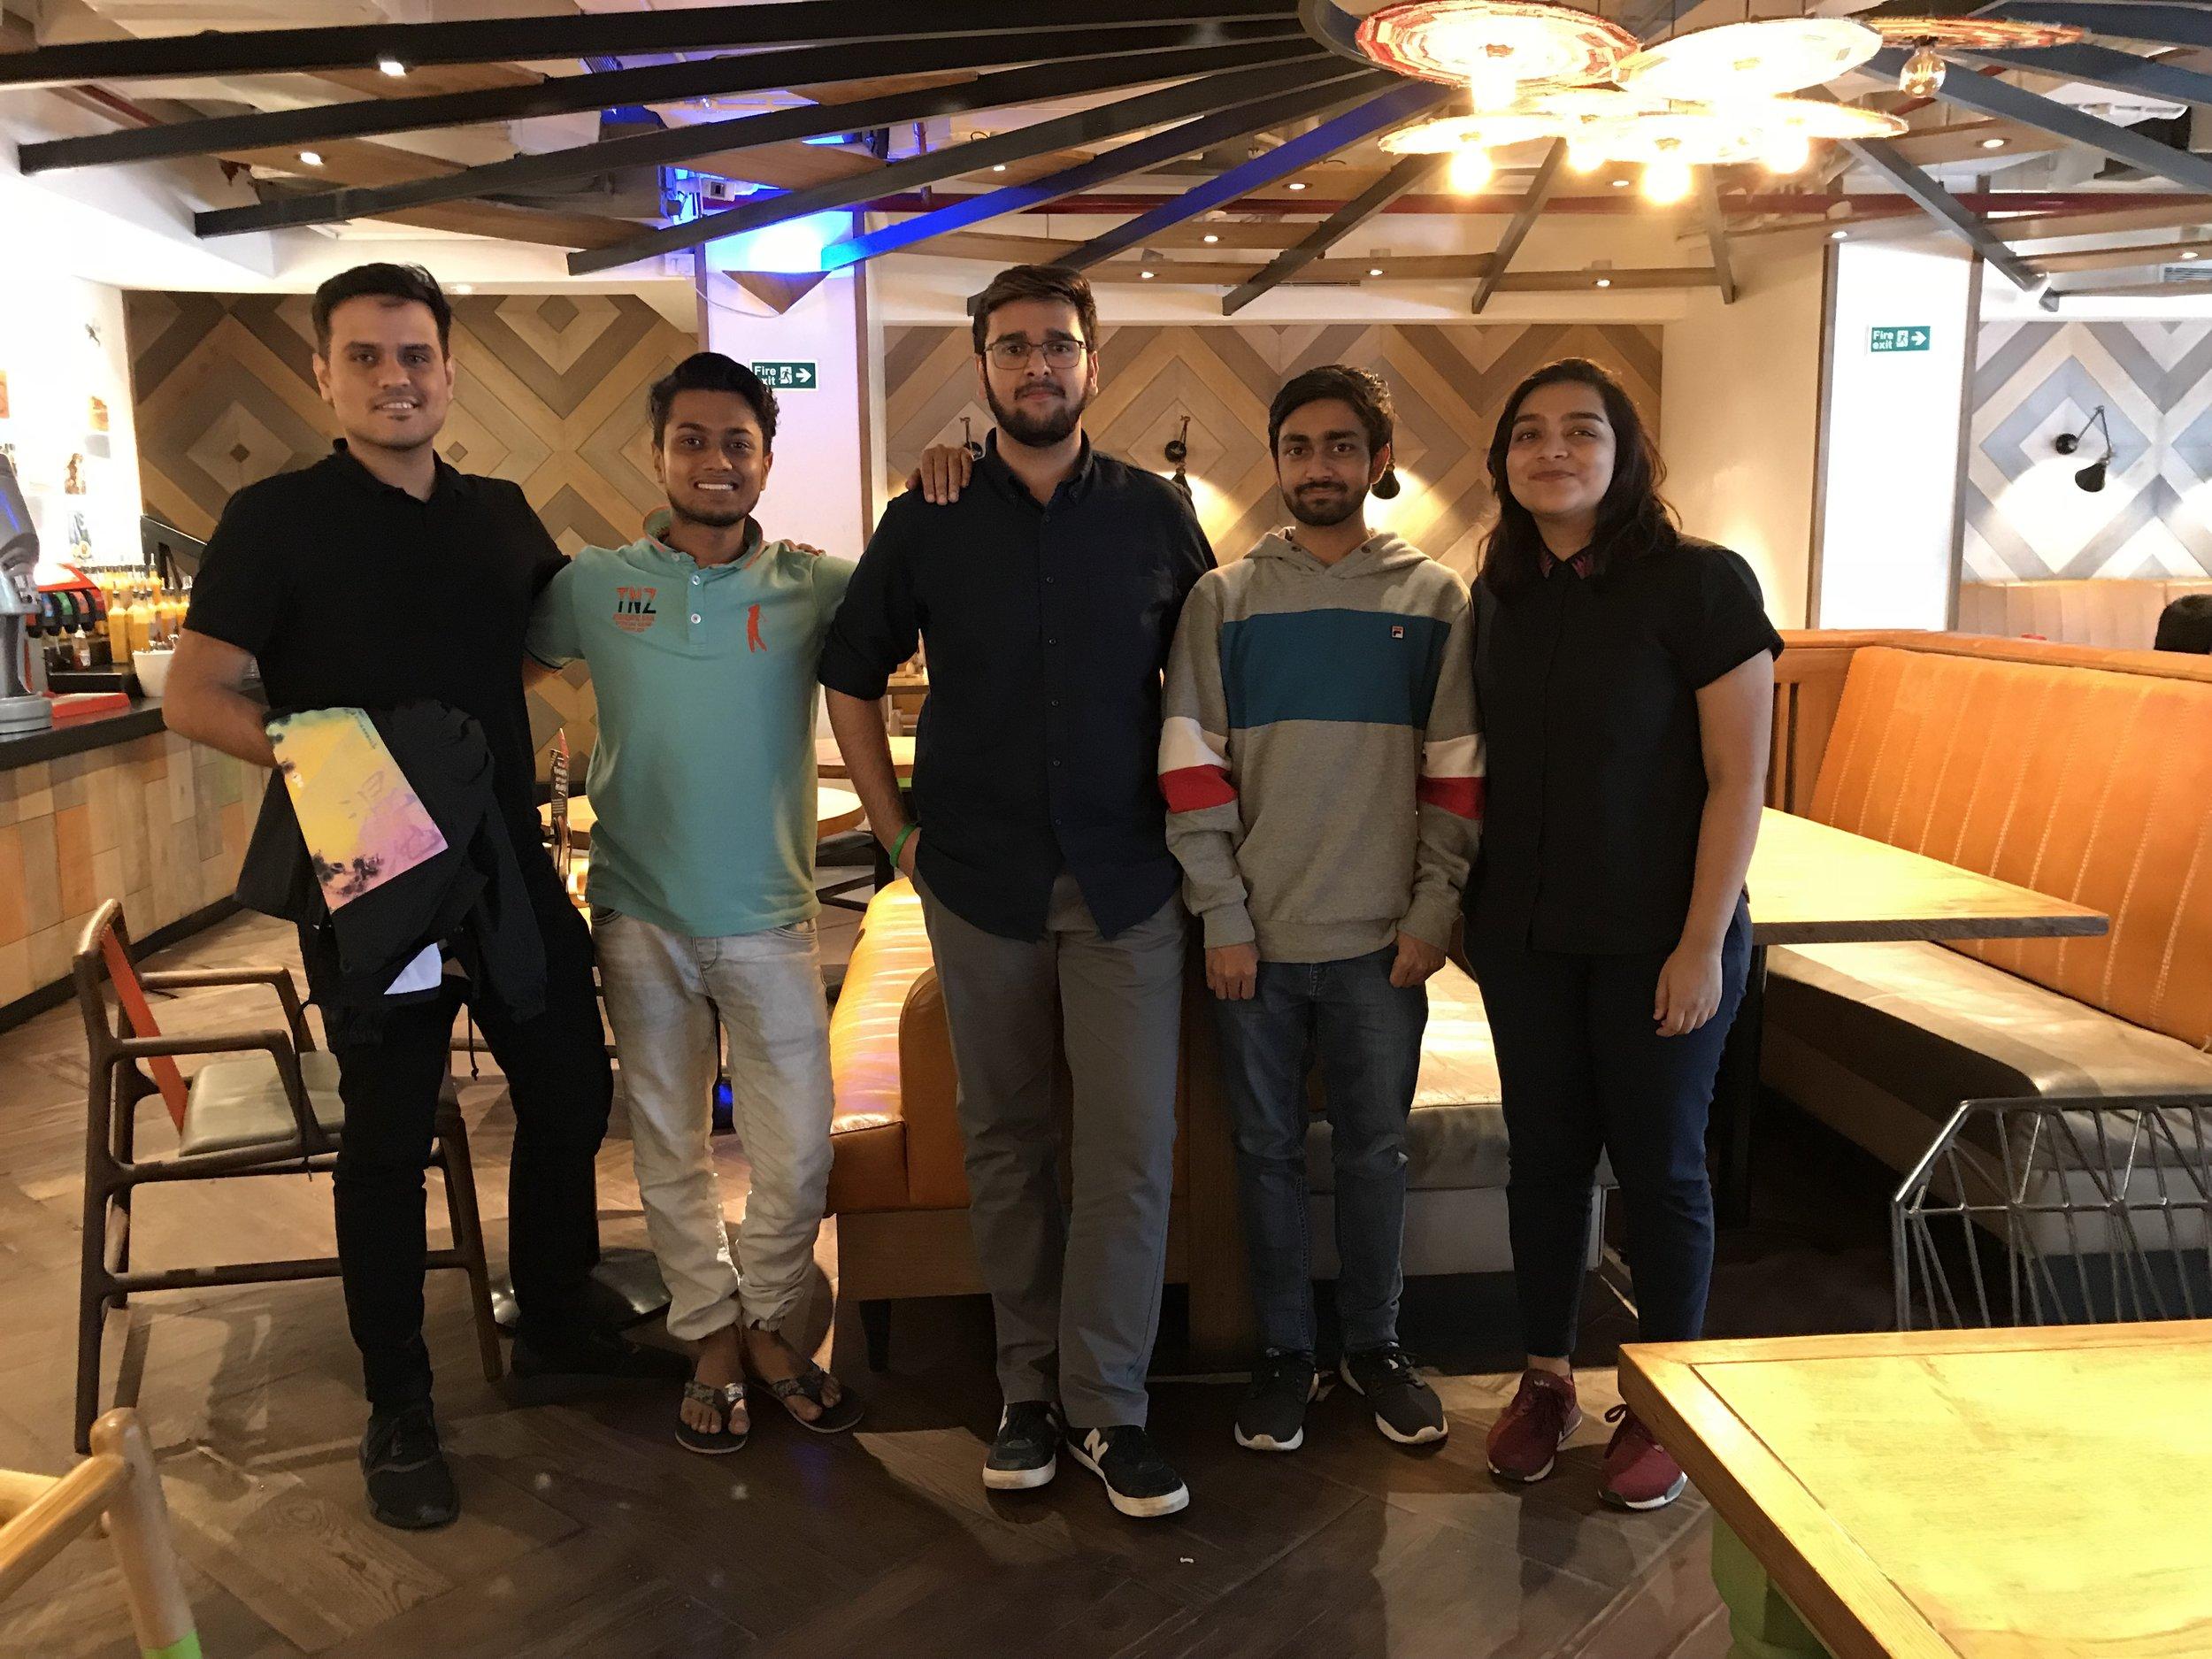 Unacademy Design Team (L to R): Abhinav, Neelank, Me, Prithvi, and Sneha